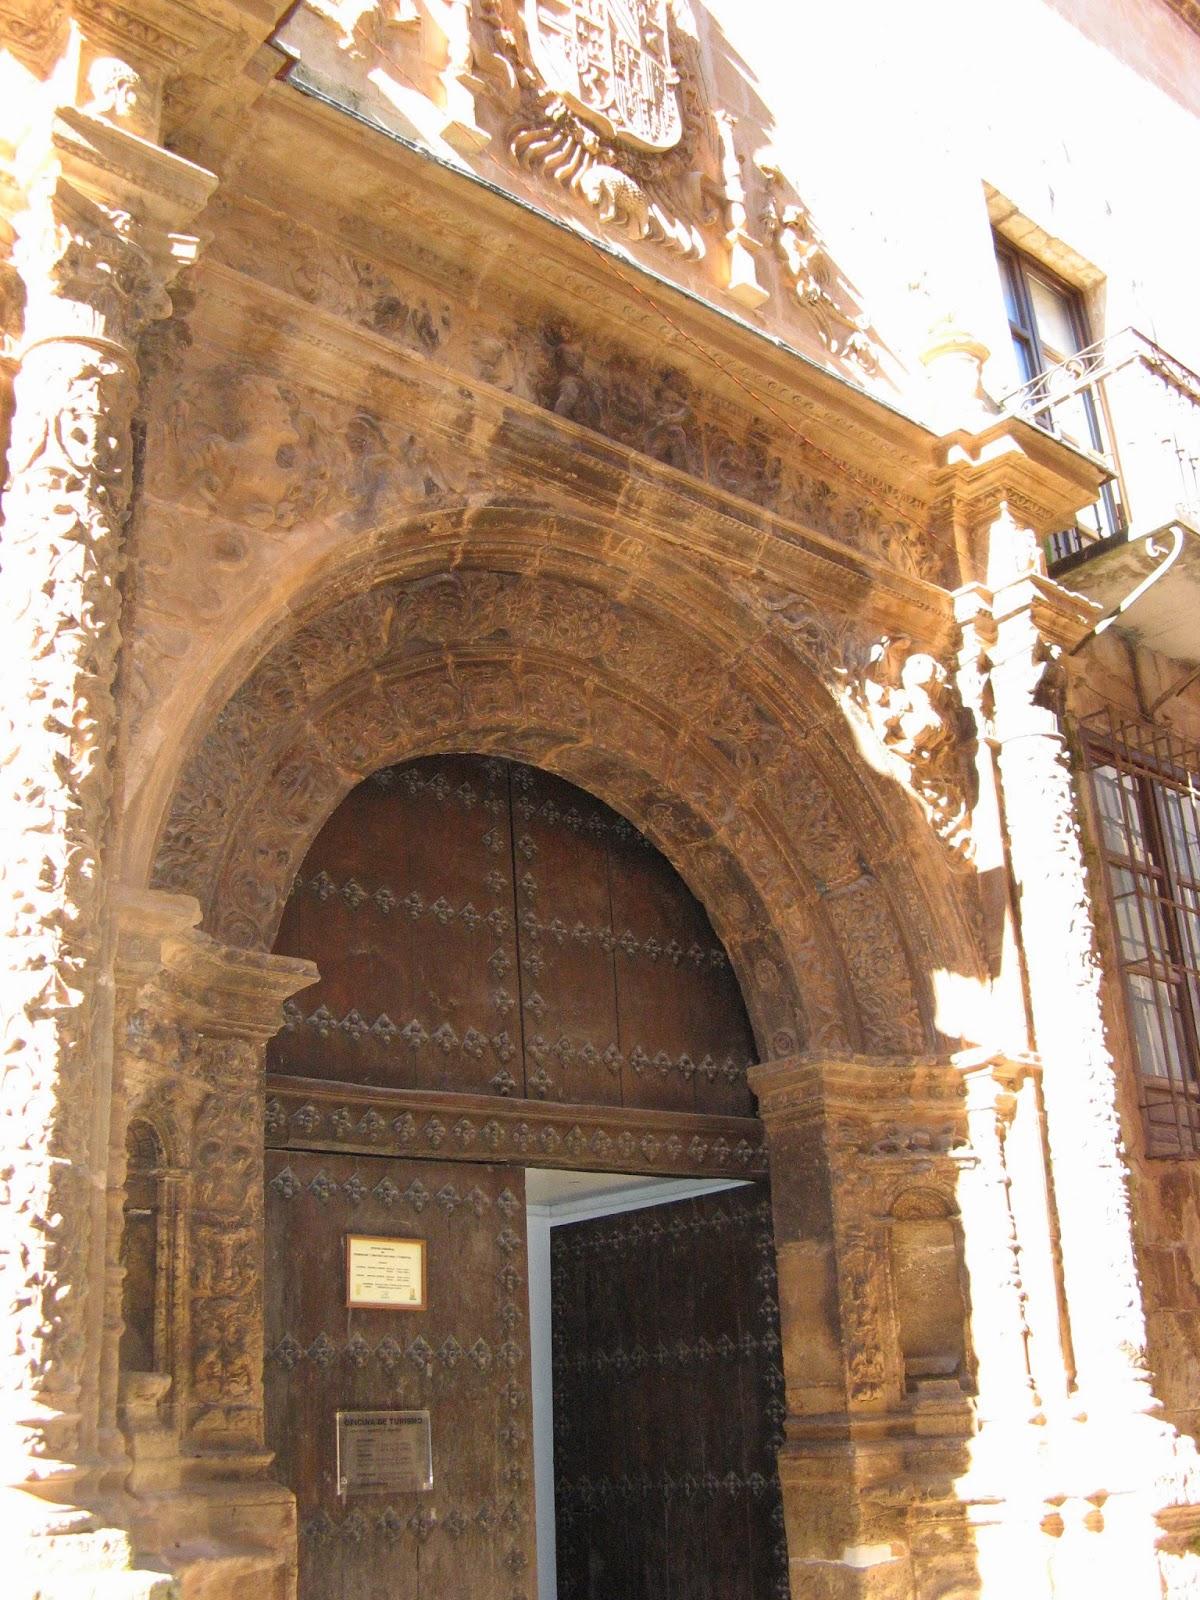 Rincones ibericos alcaraz albacete castilla la mancha for Oficina del consumidor albacete